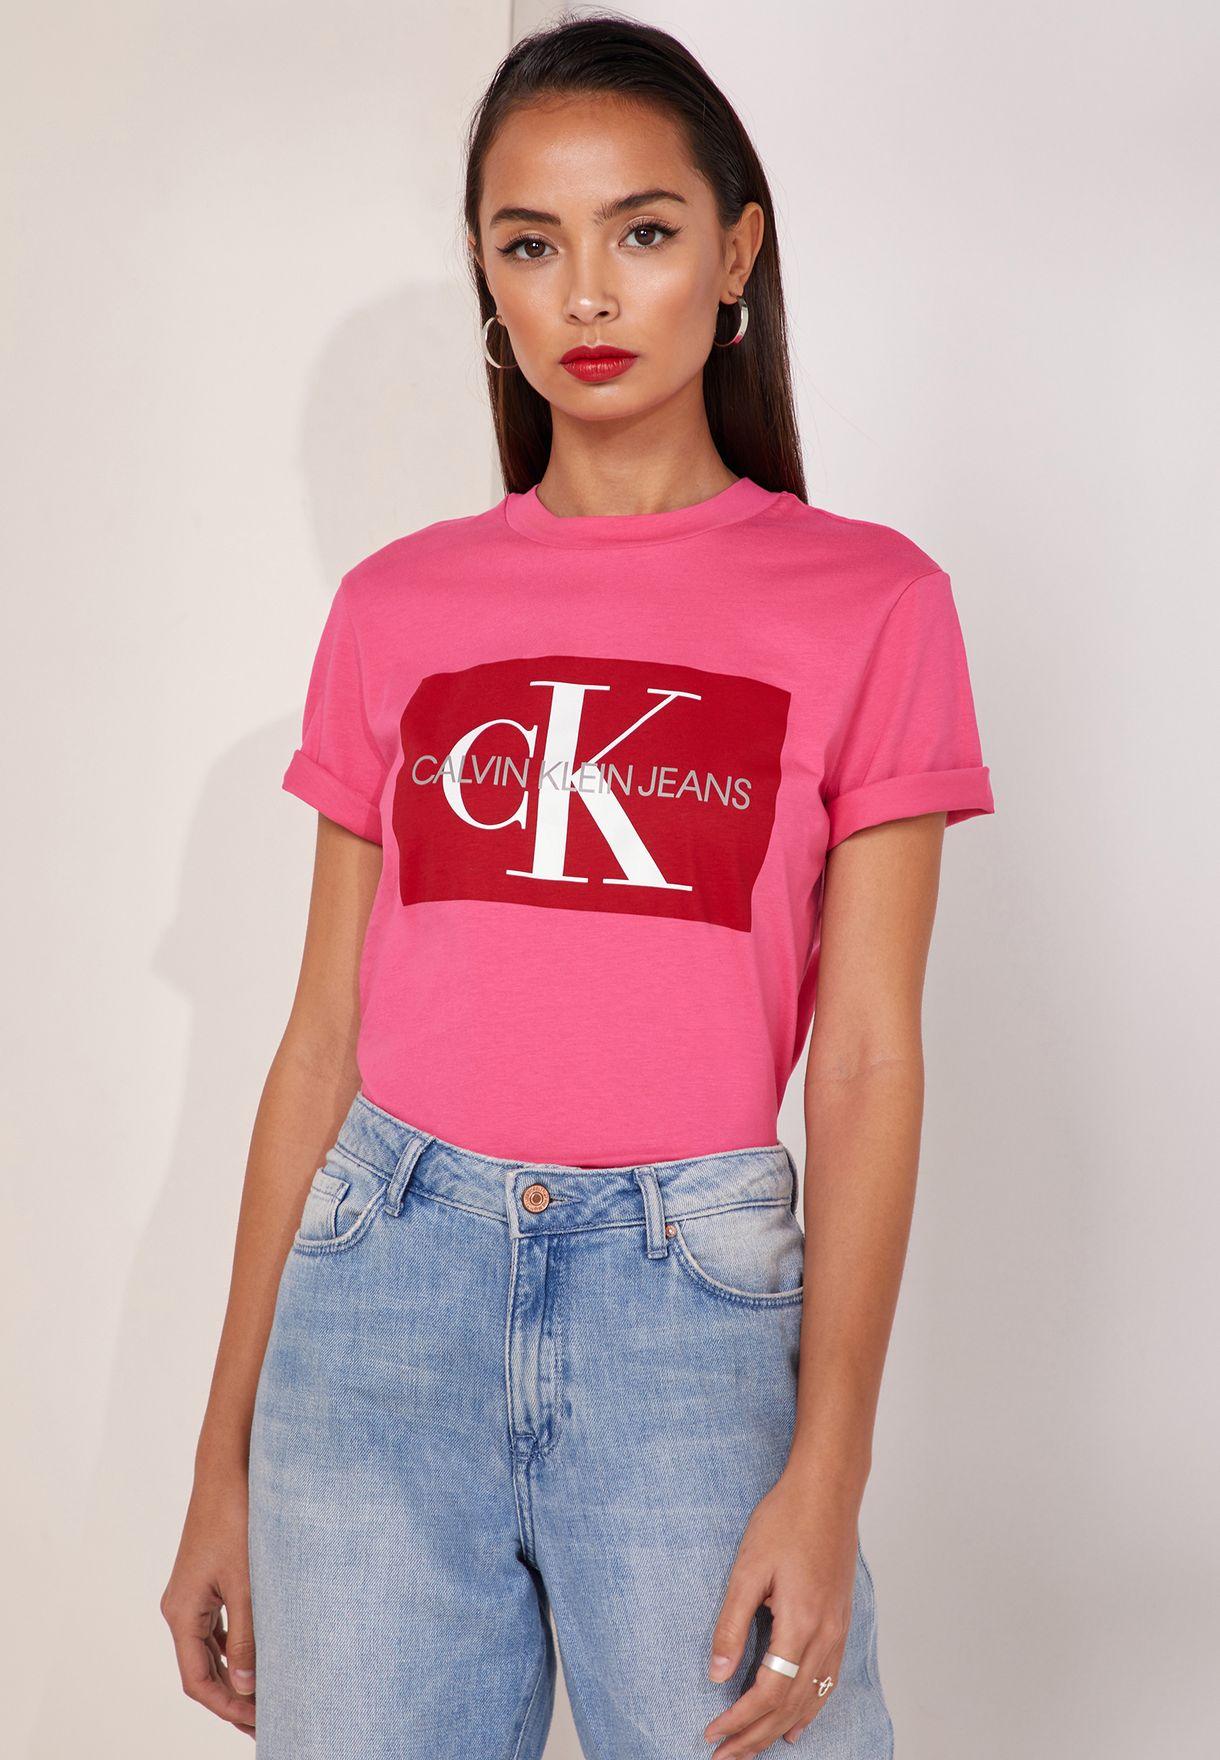 43cf5a58558 Shop Calvin Klein Jeans pink Iconic Monogram Box Logo T-Shirt ...